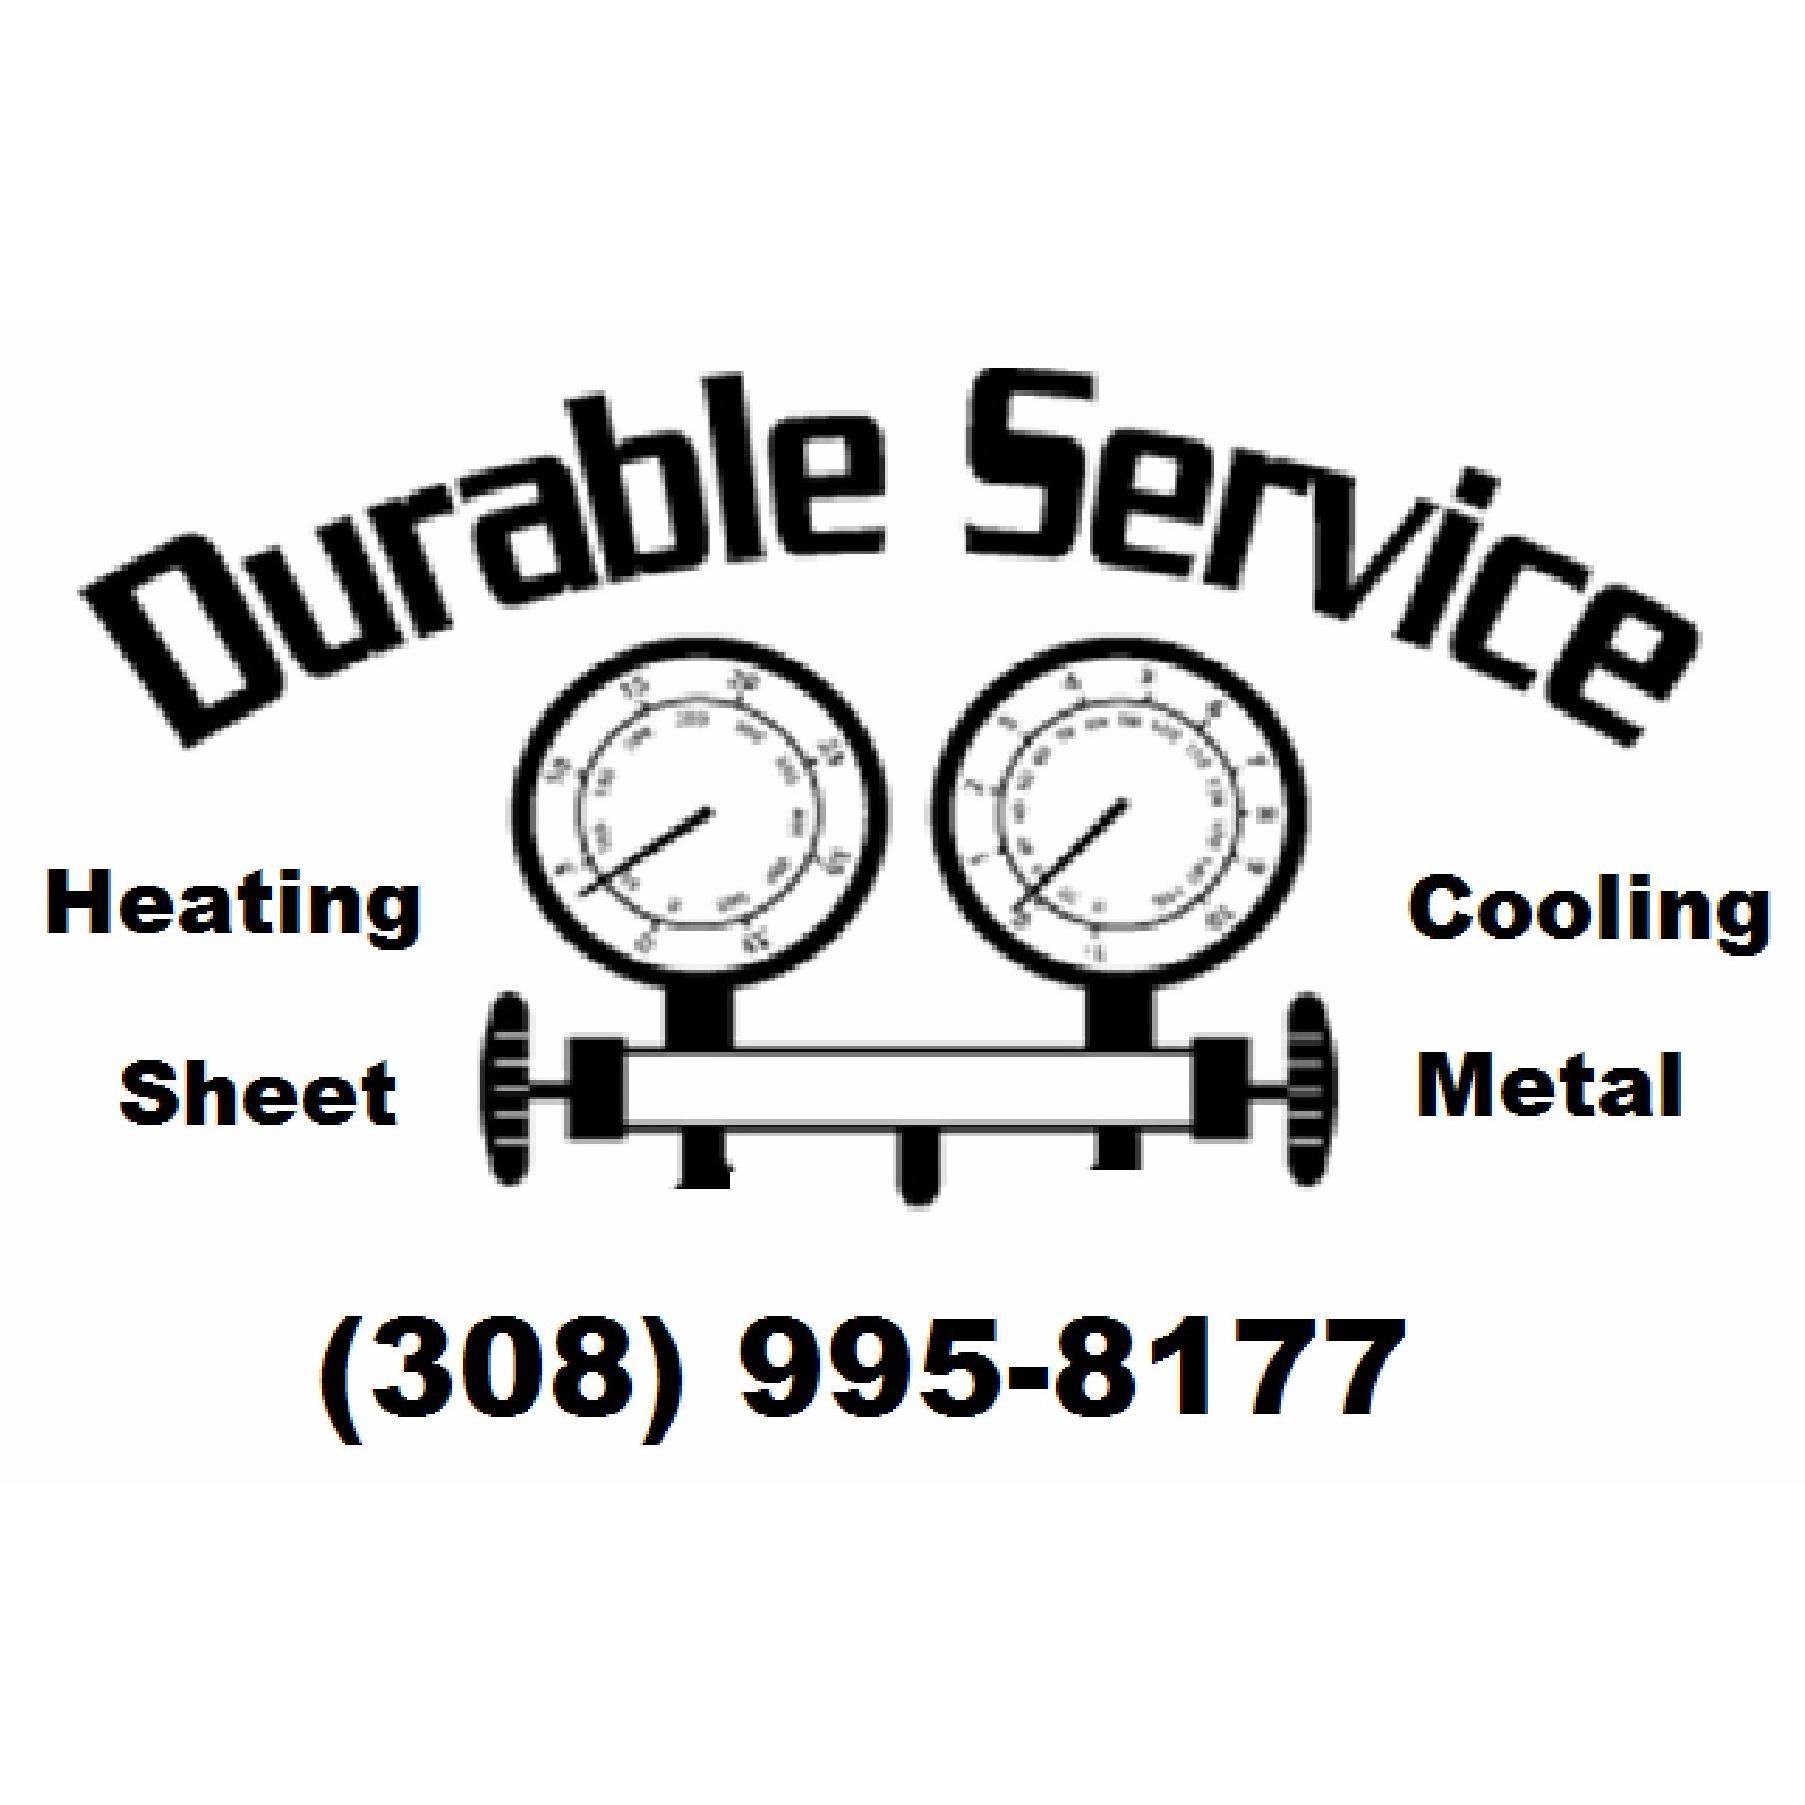 Durable Service